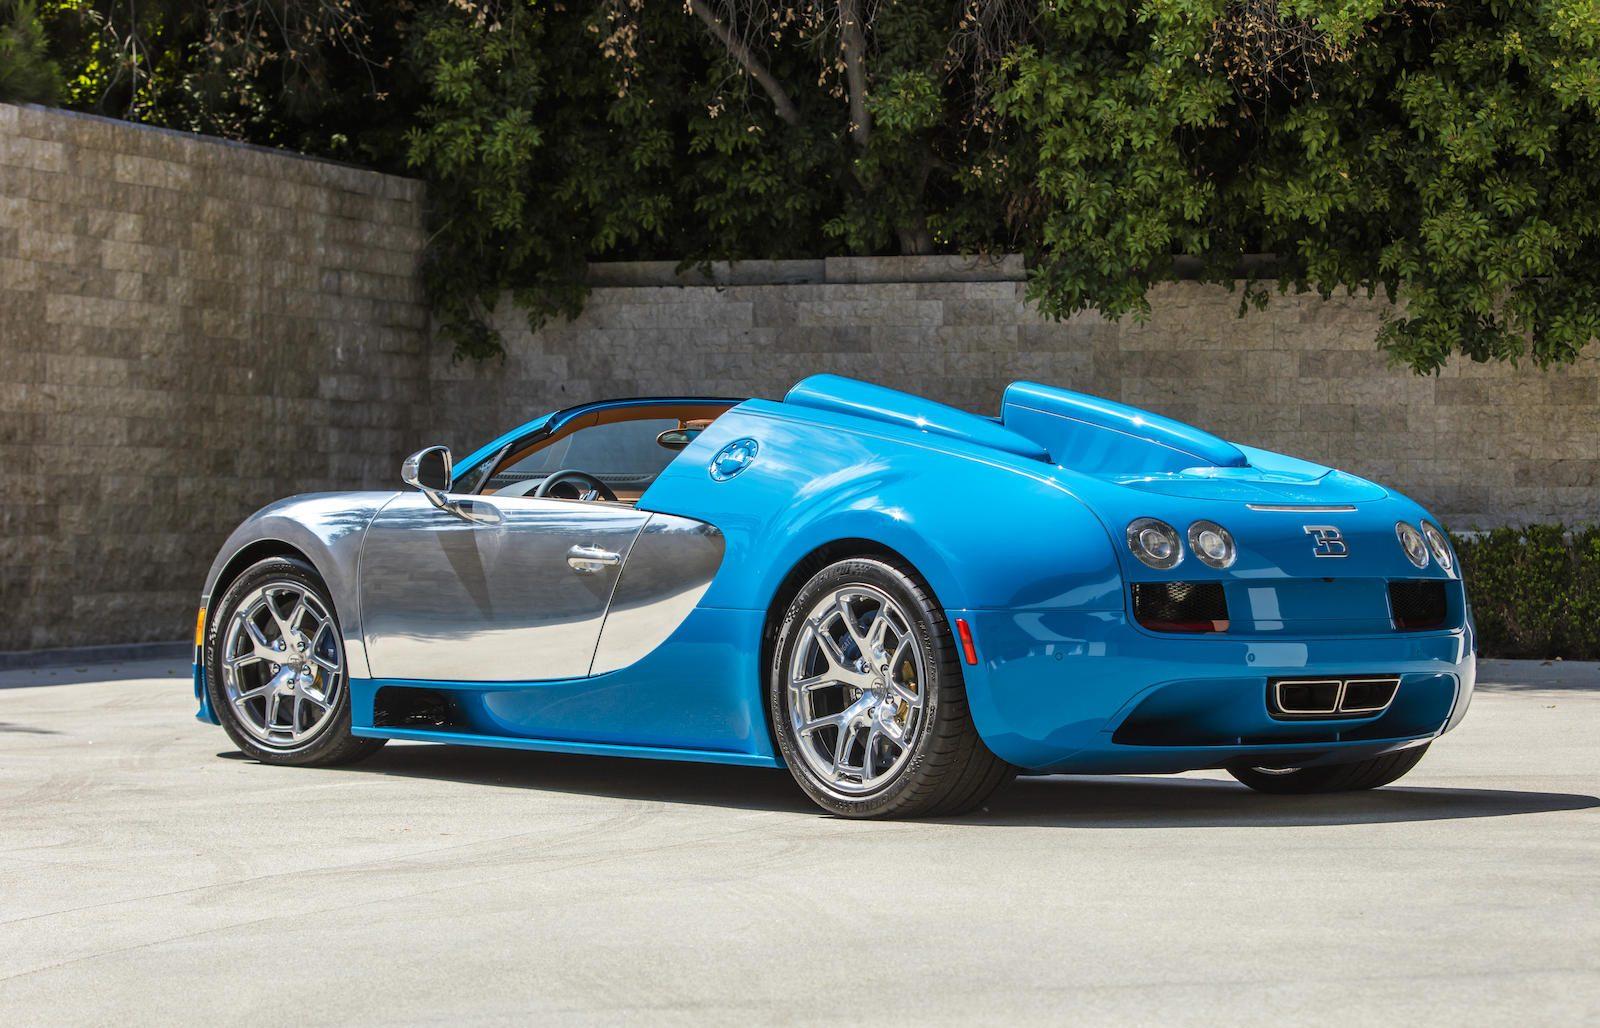 Bugatti Veyron rear three-quarter